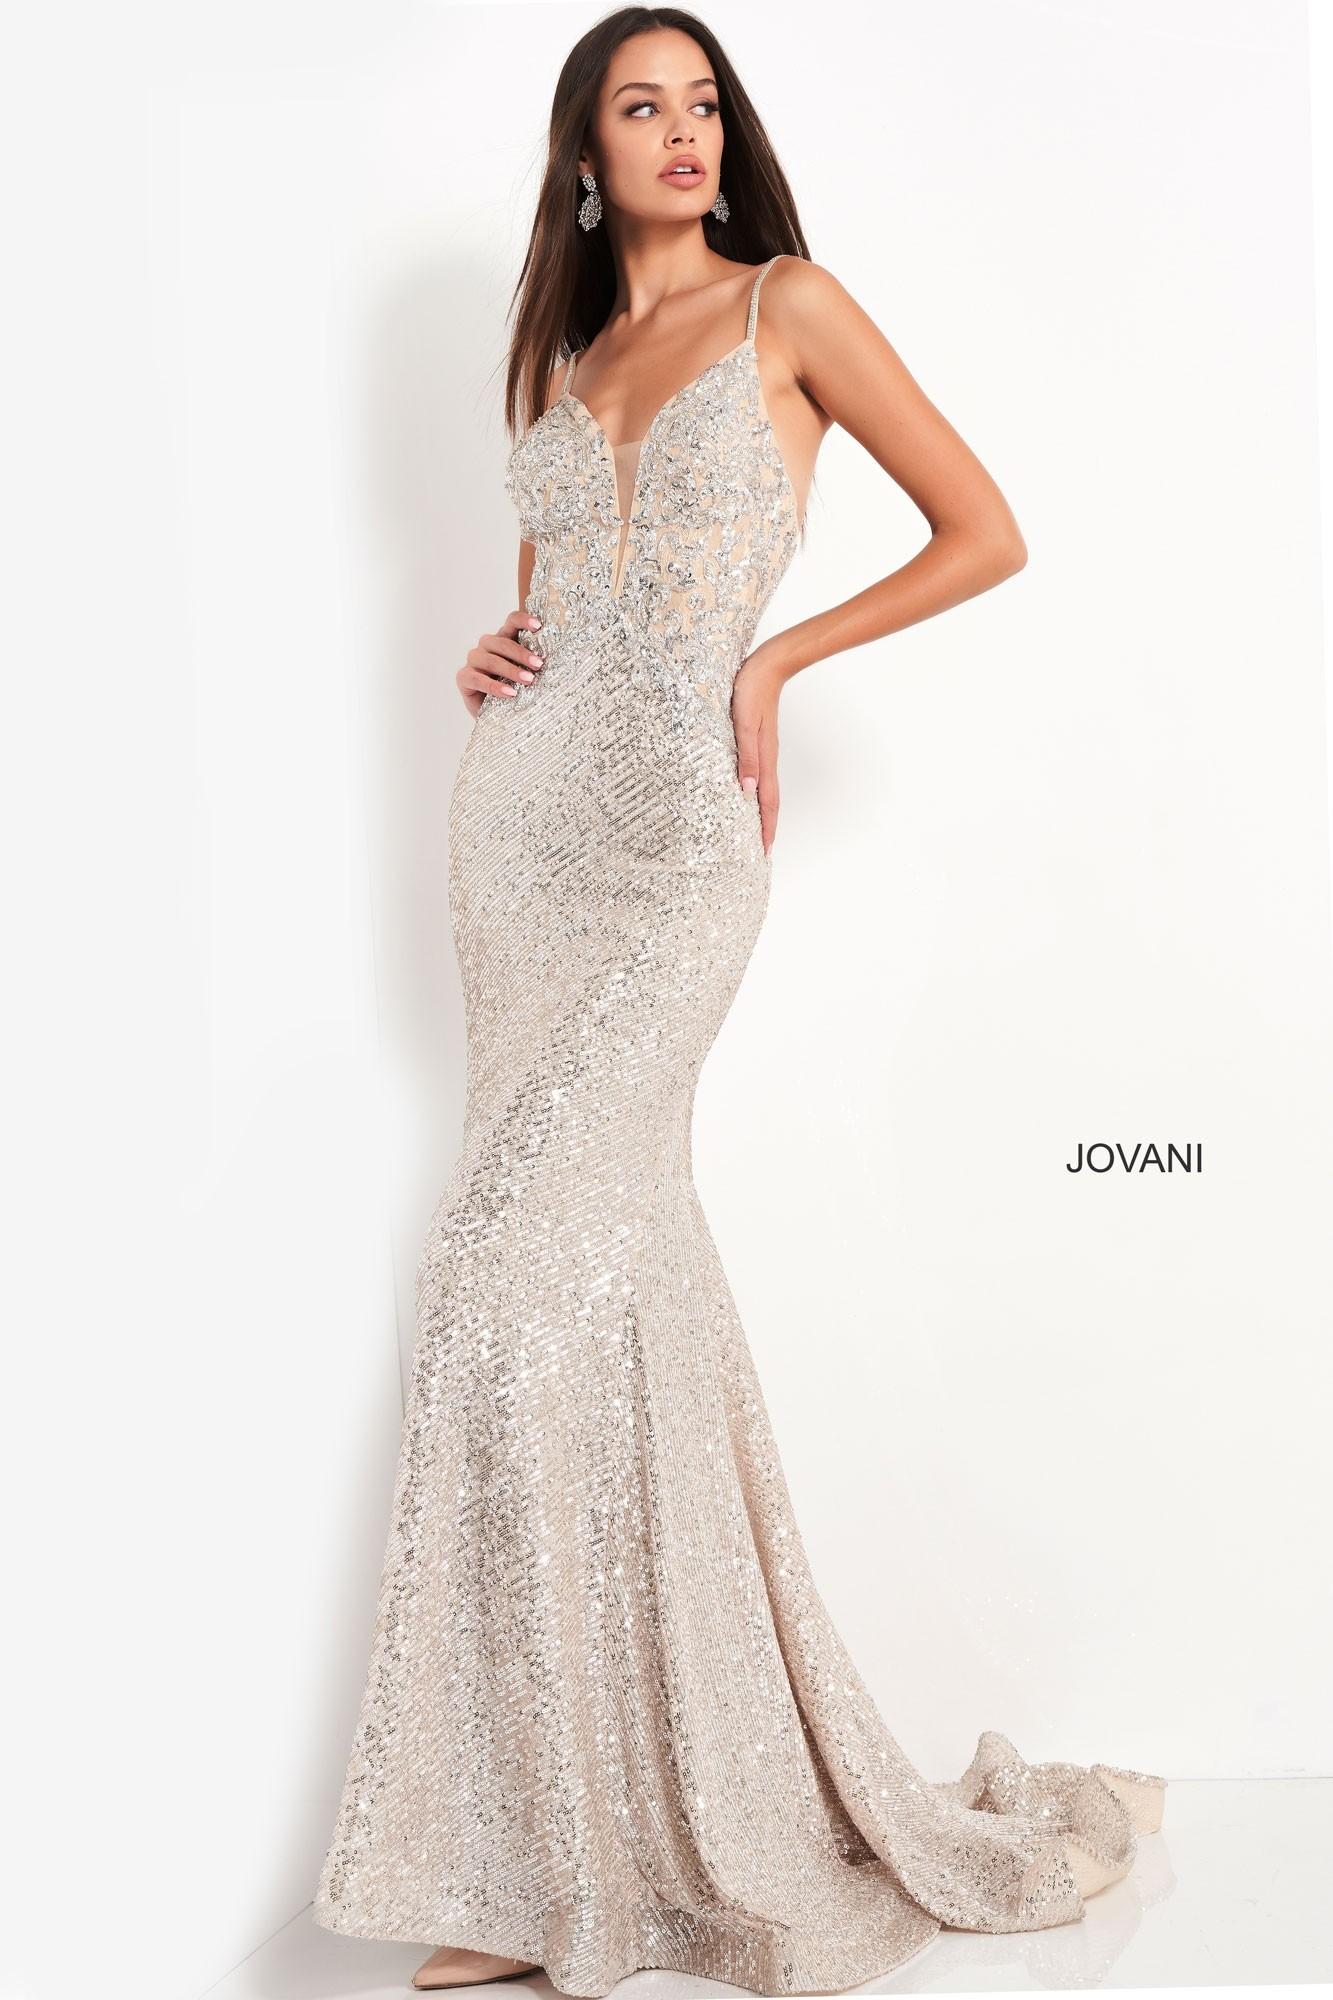 Jovani 05805 Silver Sequin Prom Dress